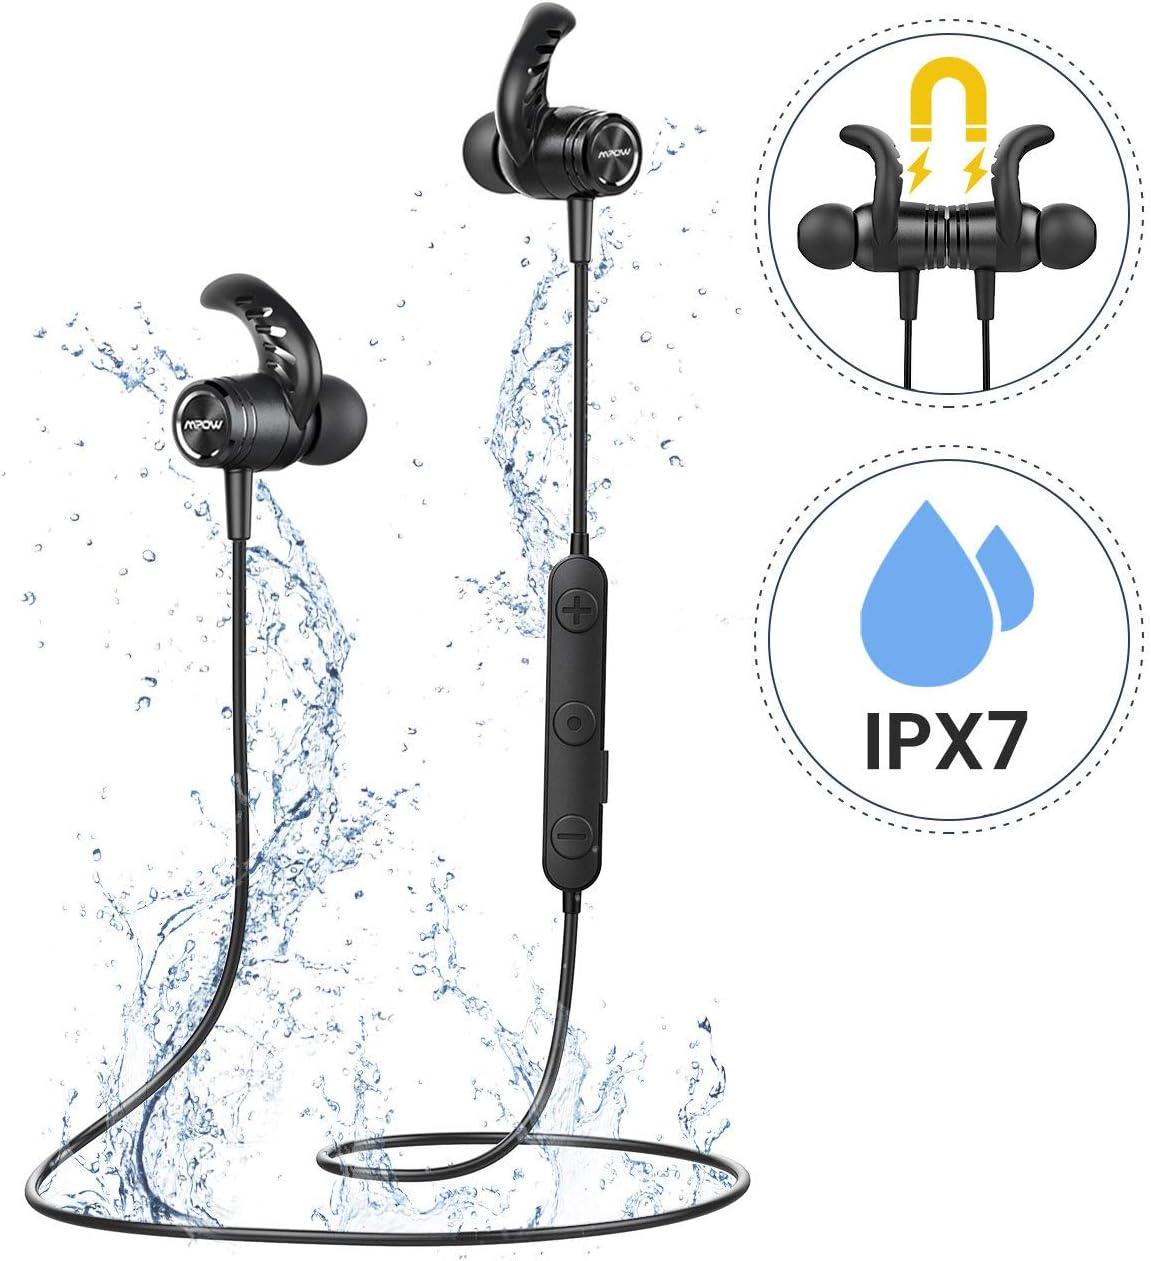 Mpow Auriculares Bluetooth 5.0, S10 IPX7 Deportivos Inalámbrico Magnético In Ear Estéreo CVC 6.0 Micrófono con Cancelación de Ruido para Deportes, Oficina en Casa, Trabajo para iPhone Android